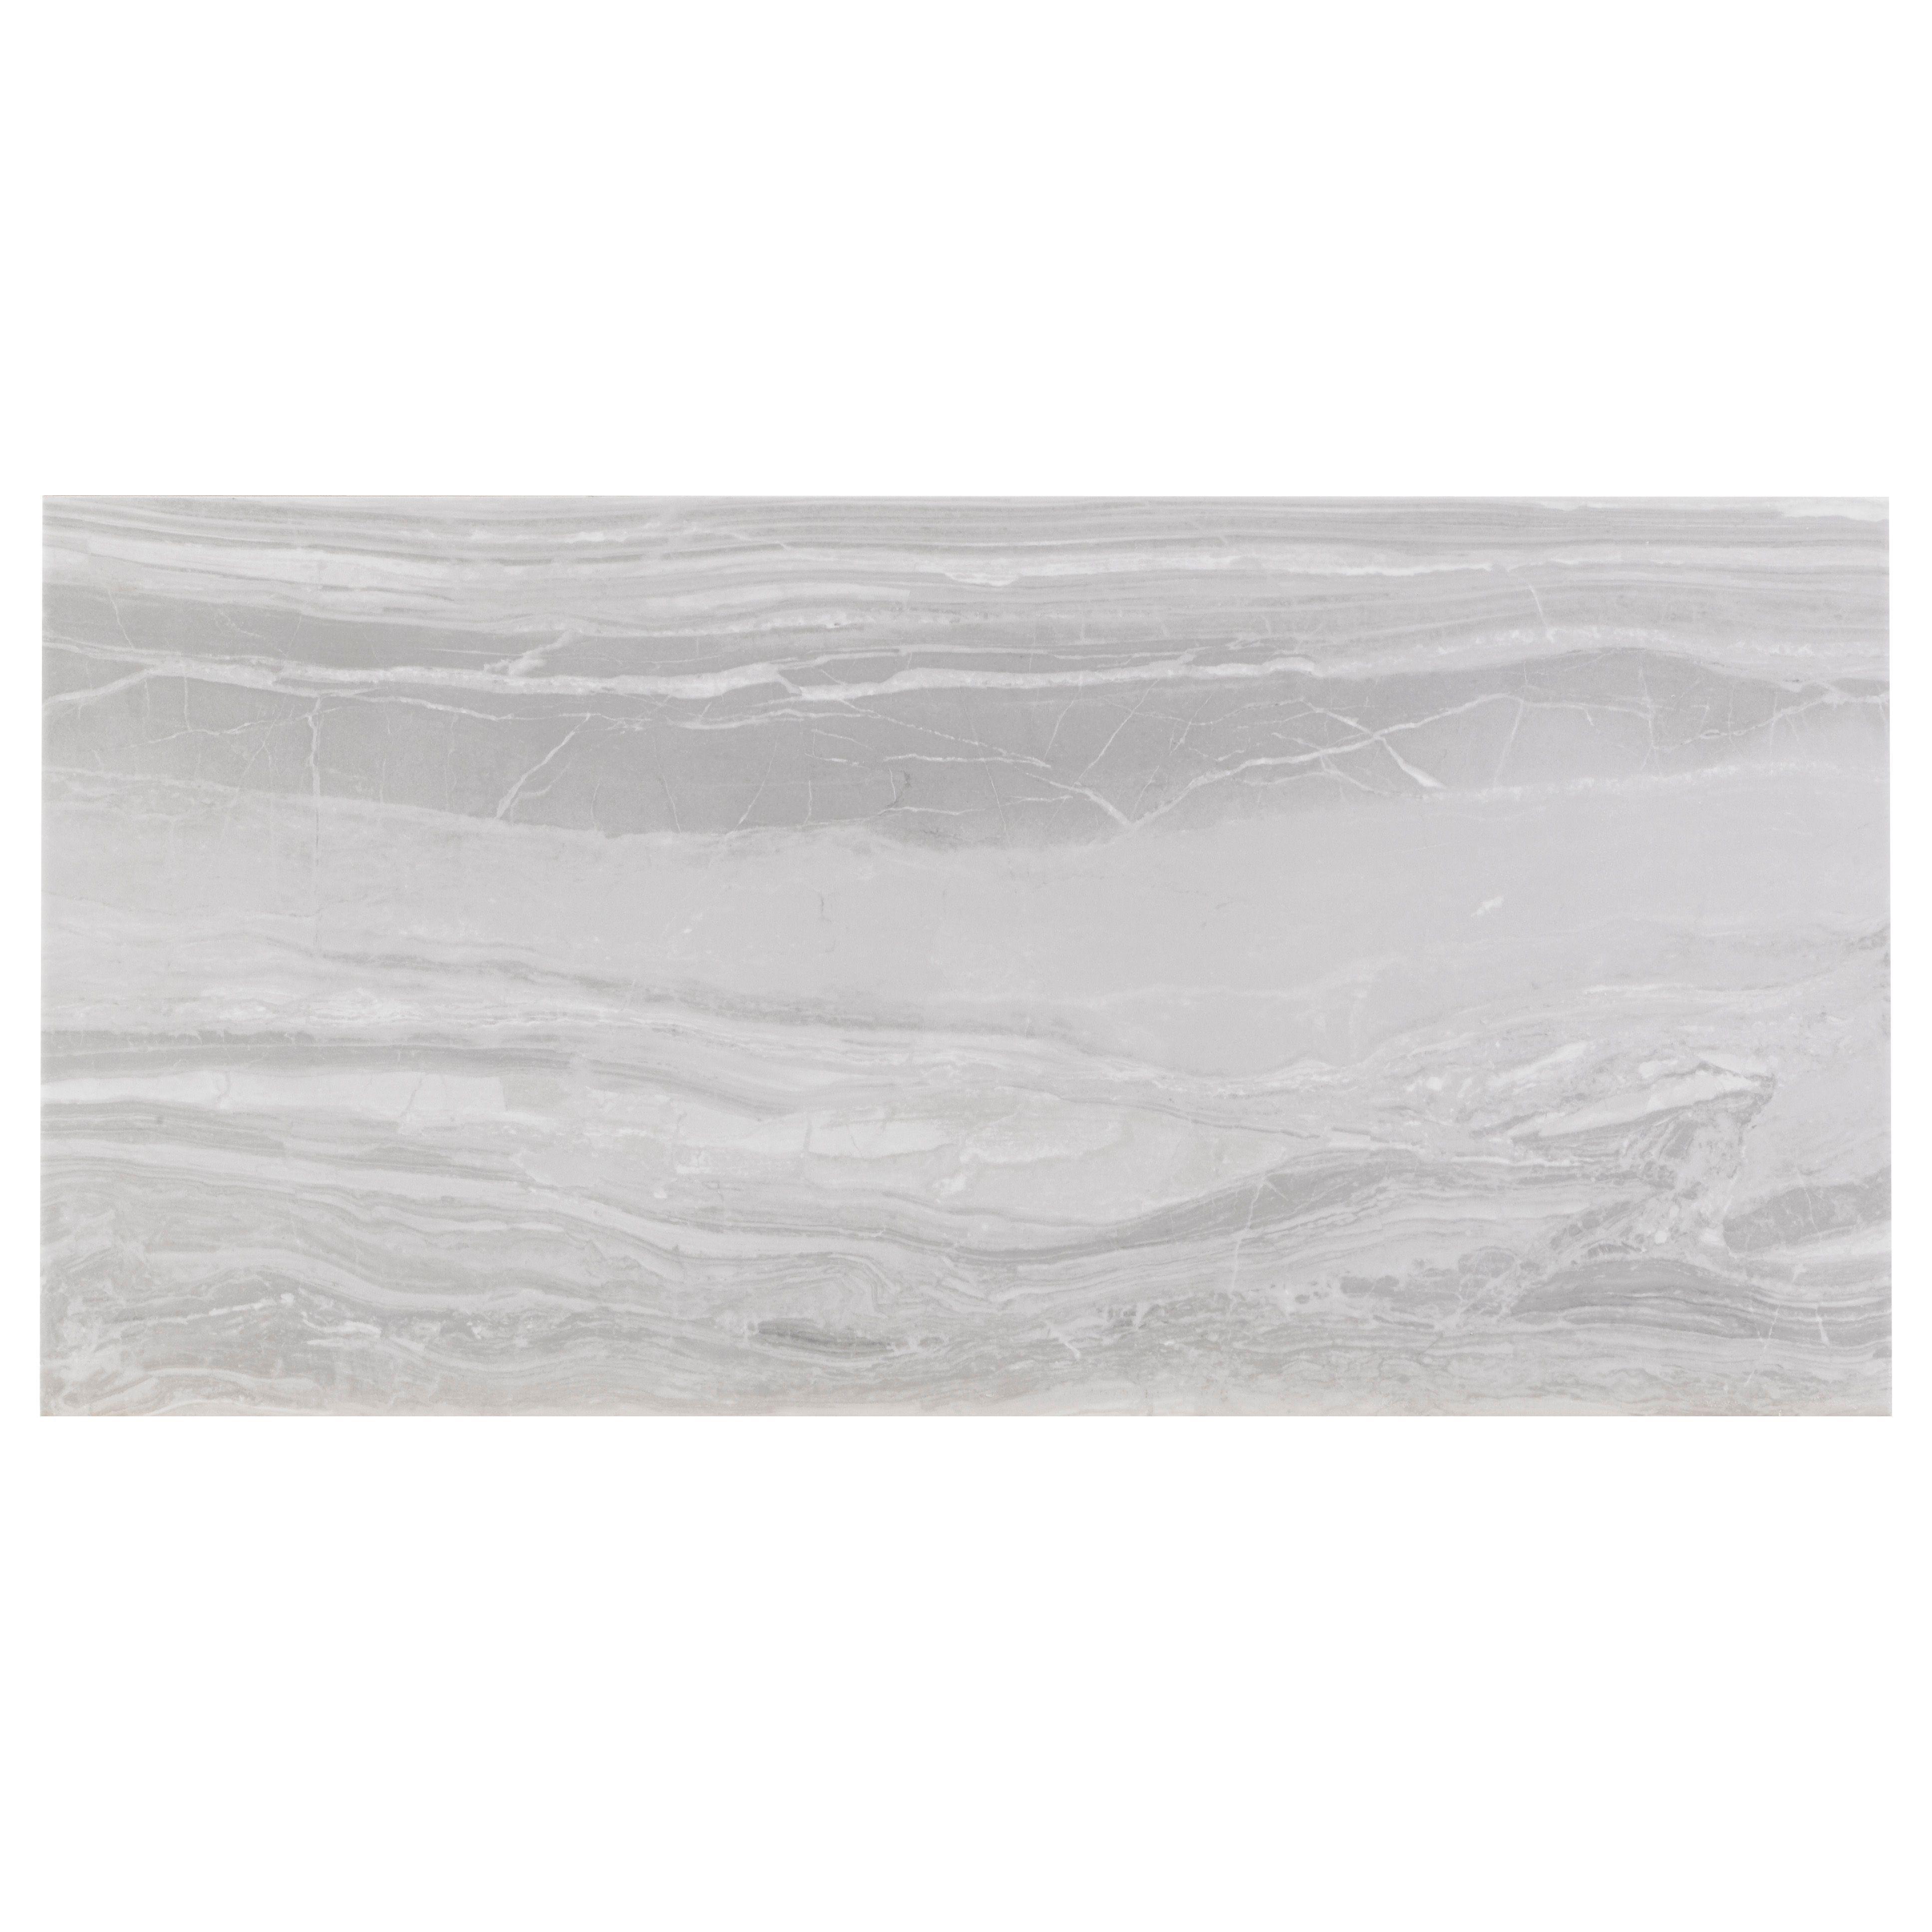 Bq Ceramic Kitchen Floor Tiles Fossilised Wood Pebble Stone Effect Ceramic Sample Wall Floor